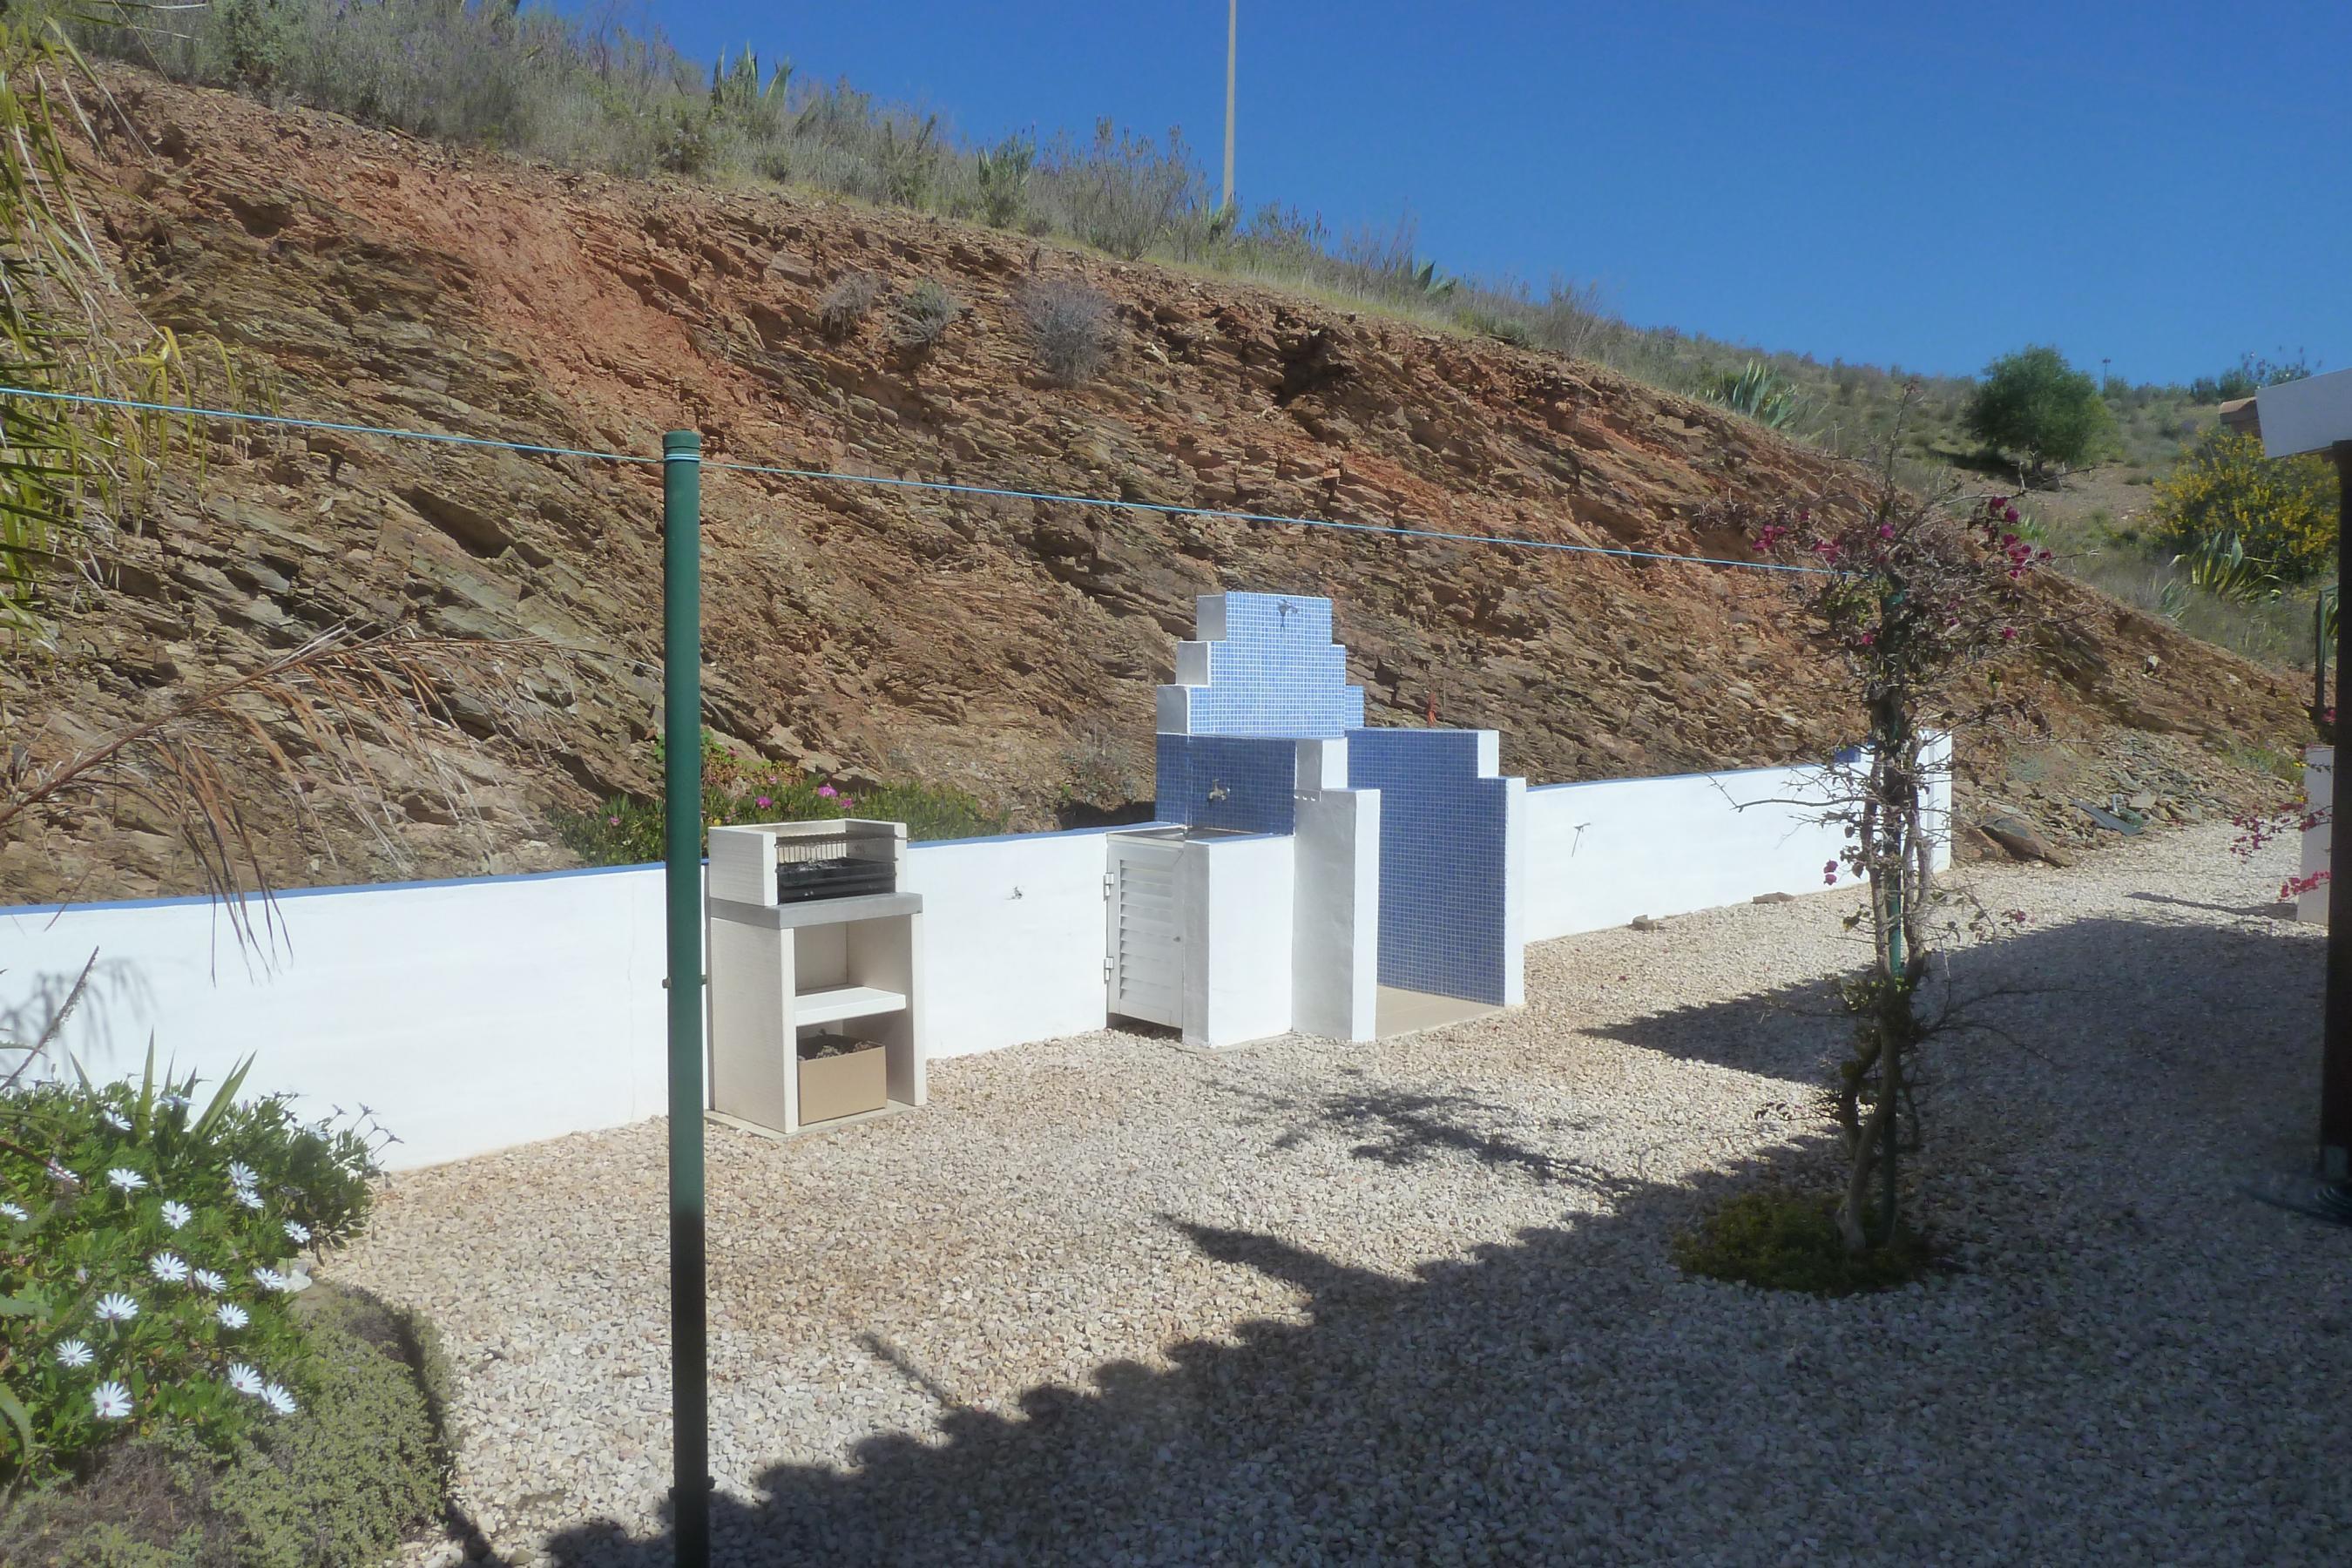 Location appartements et villas de vacance, Nice cottage with sea view in rural Serra de Tavira à Tavira, Portugal Algarve, REF_IMG_6725_9301